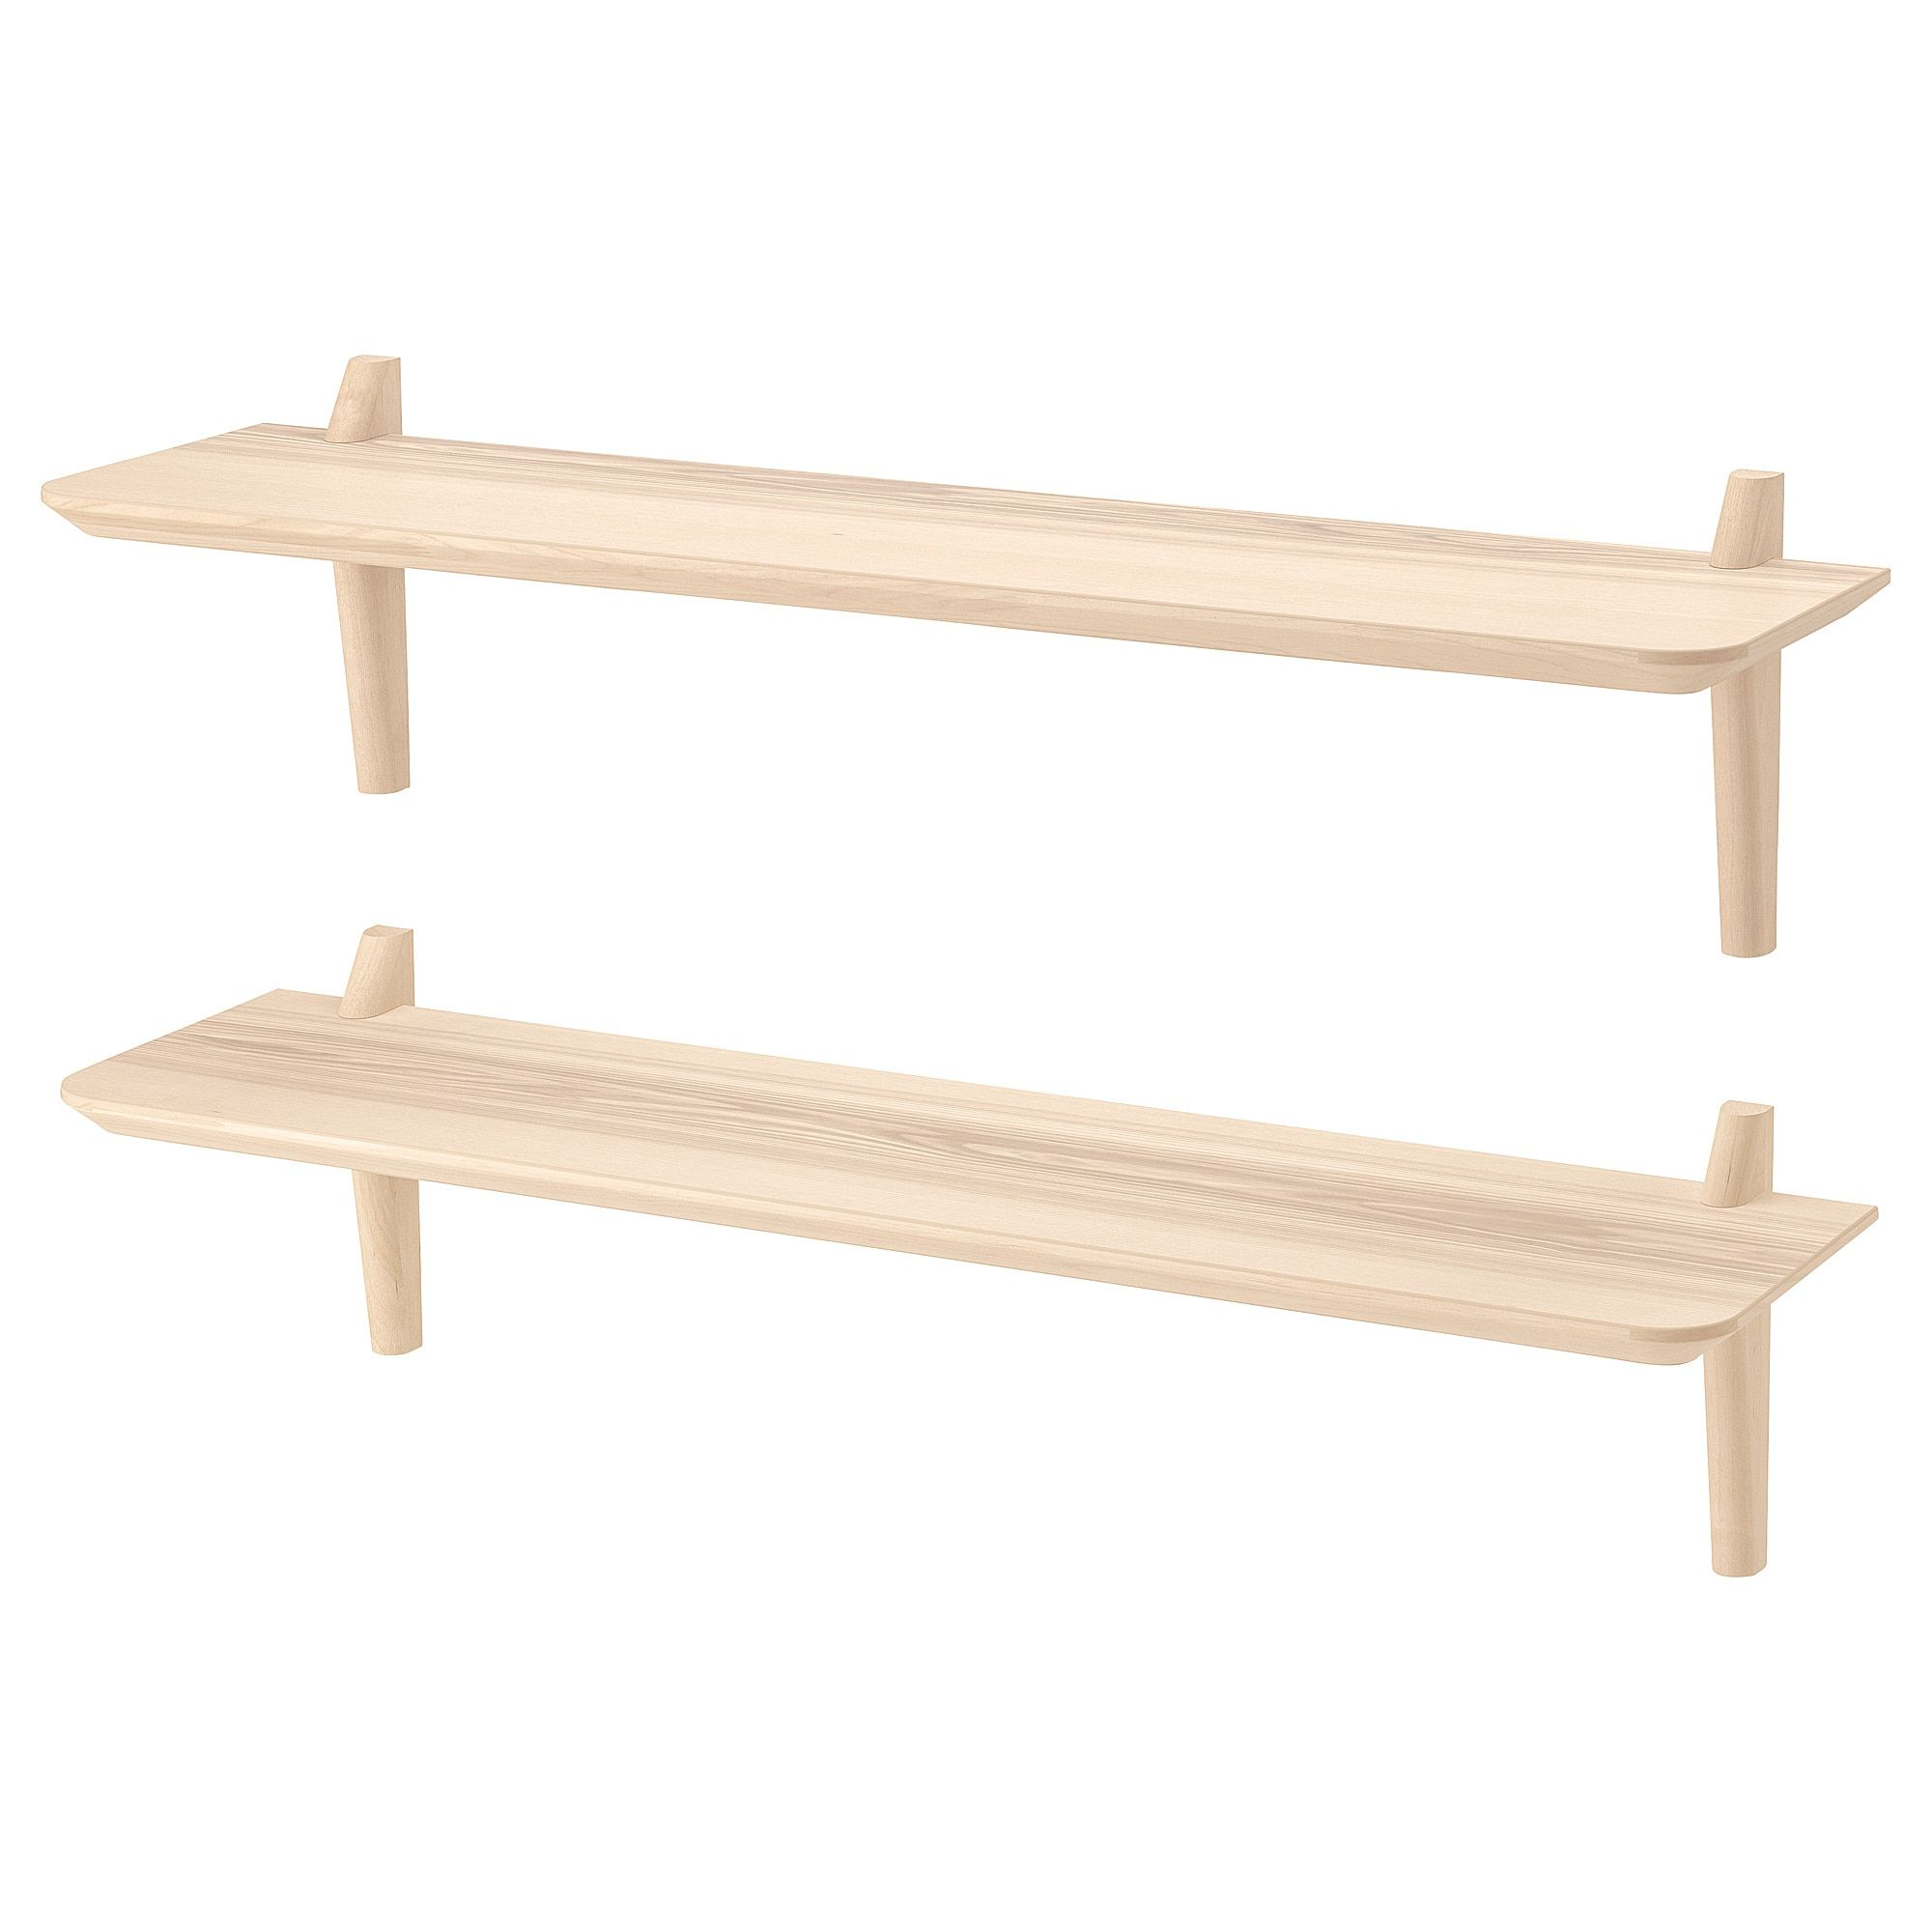 Lisabo Wall Shelf Combination Ash Veneer 46 1 2x11 3 4x11 3 4